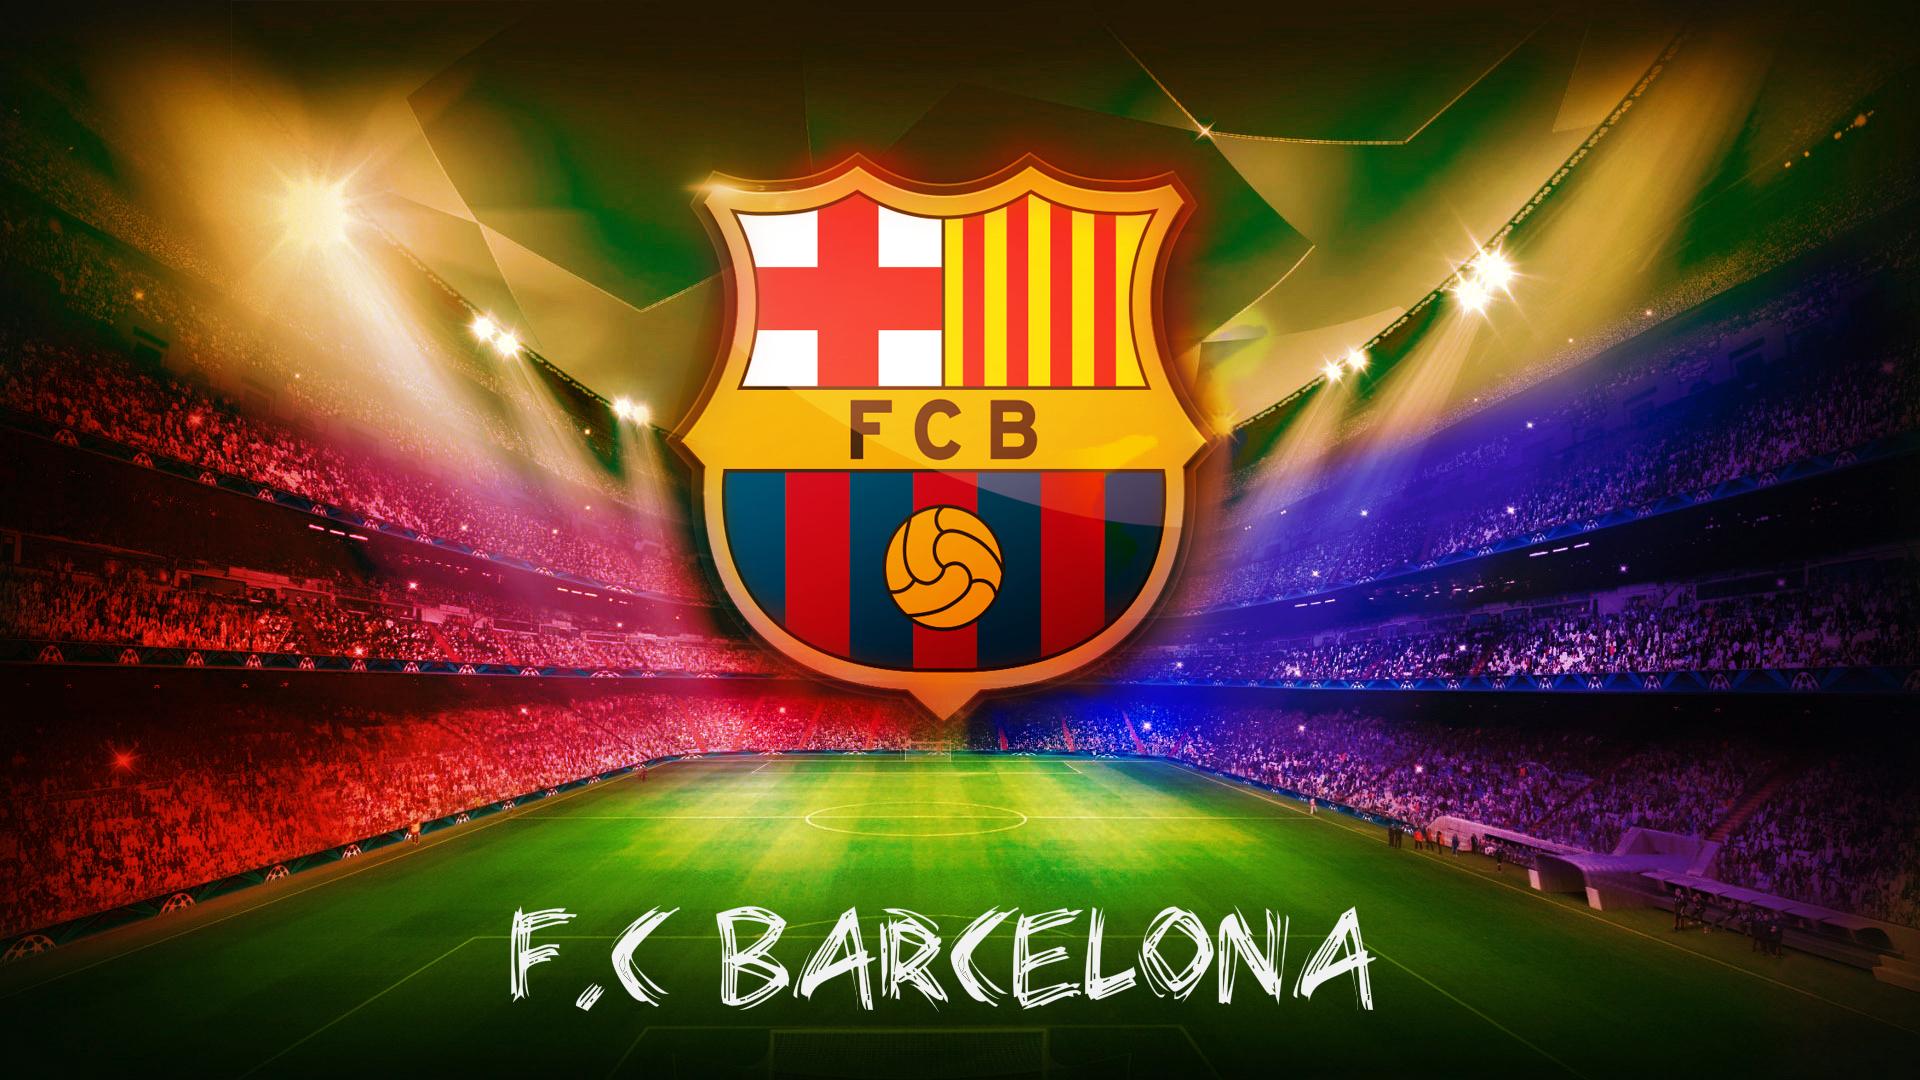 FC Barcelona HD Wallpaper HD Latest Wallpapers 1920x1080